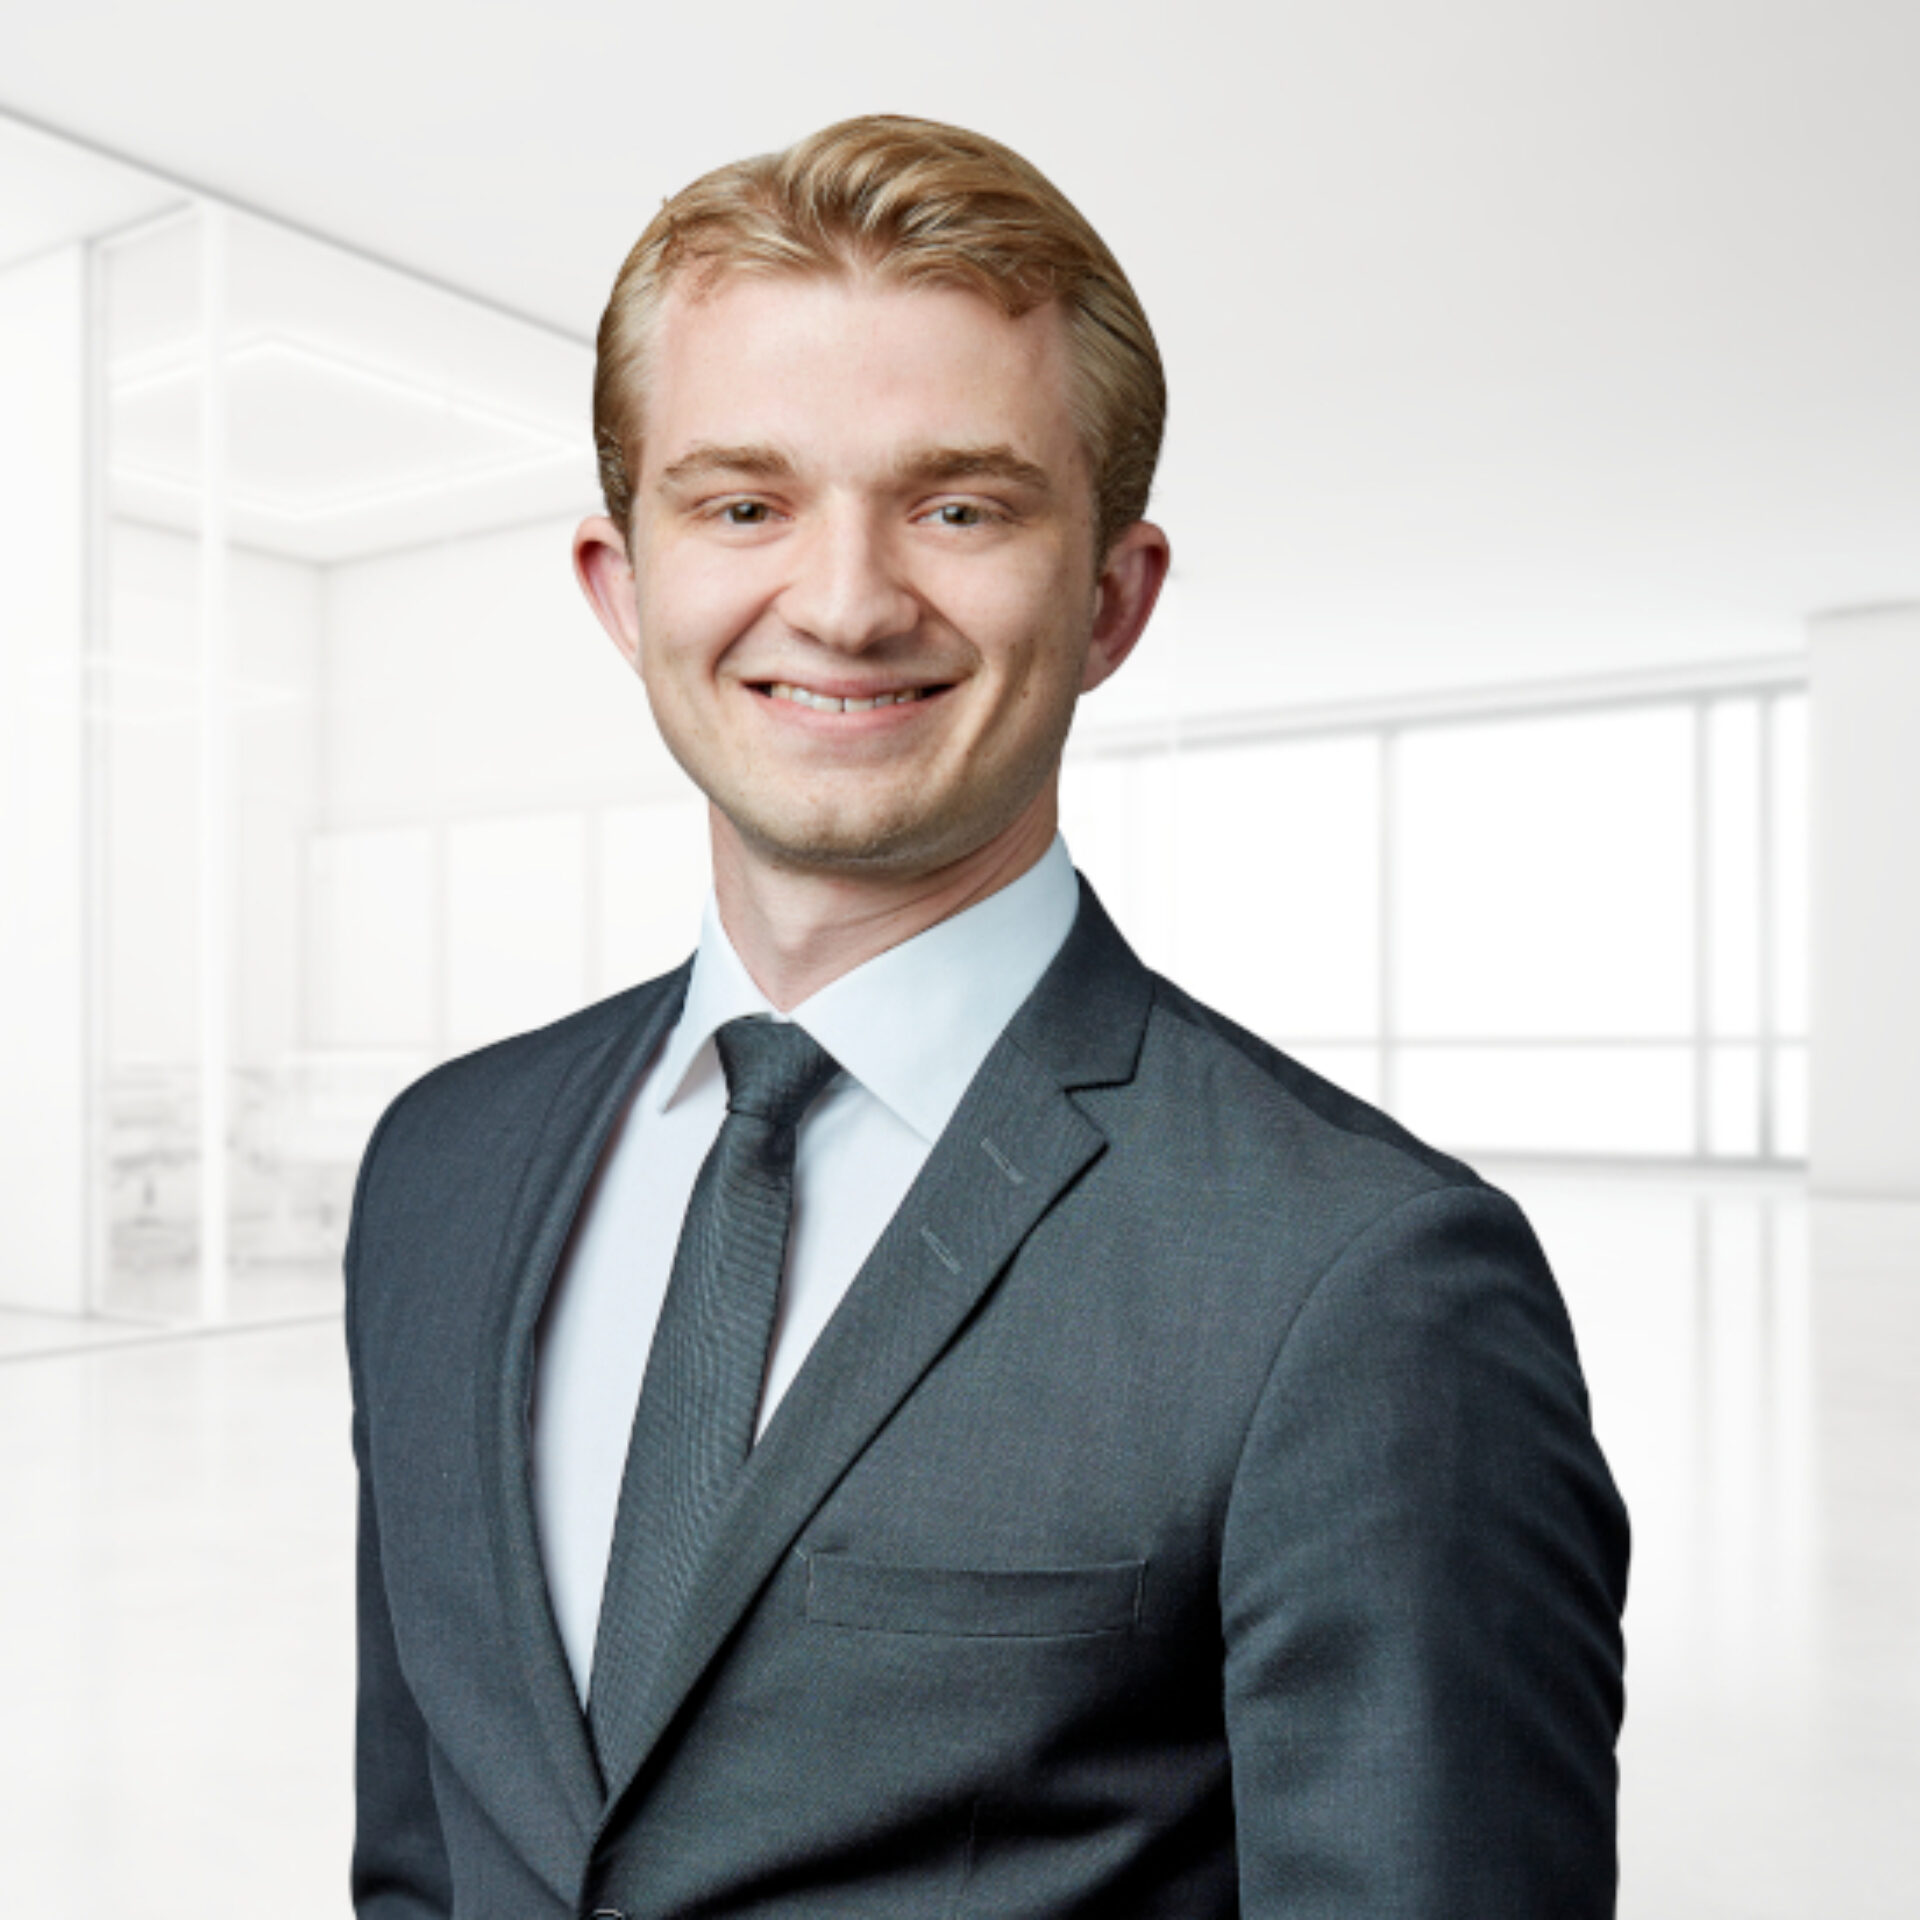 Photo of Mads-Christian Jensen